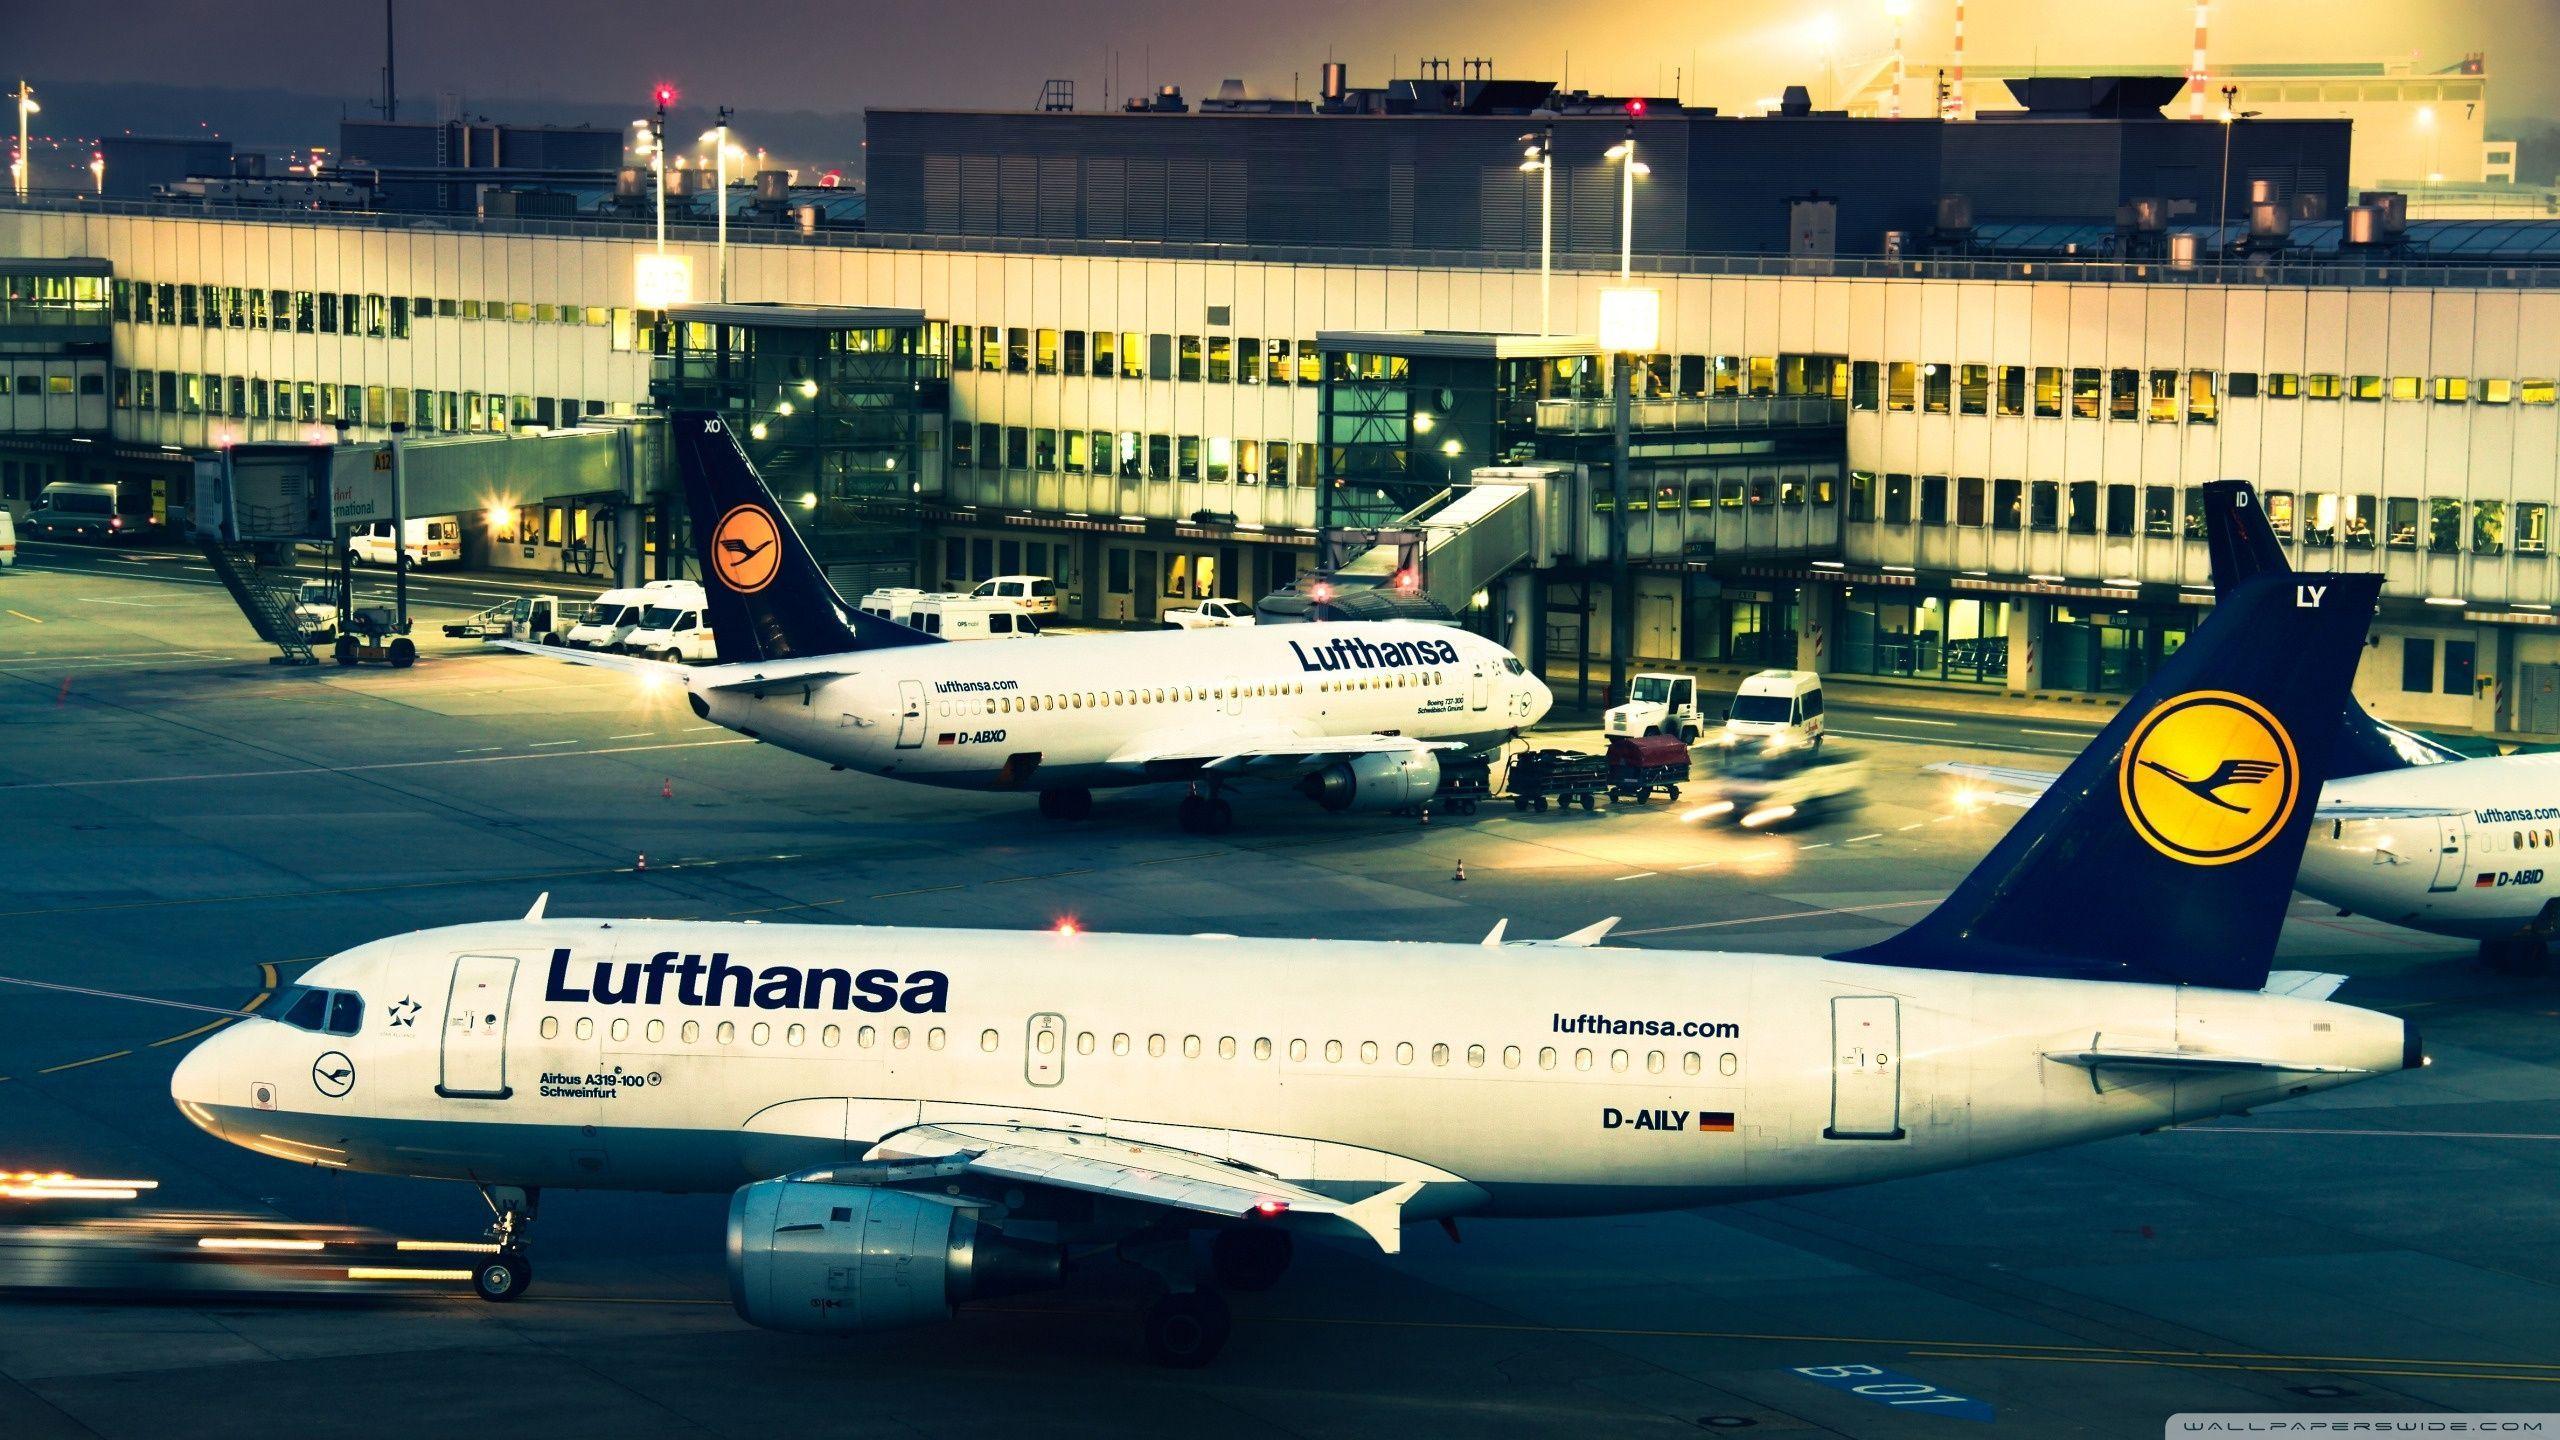 Lufthansa Resume Services